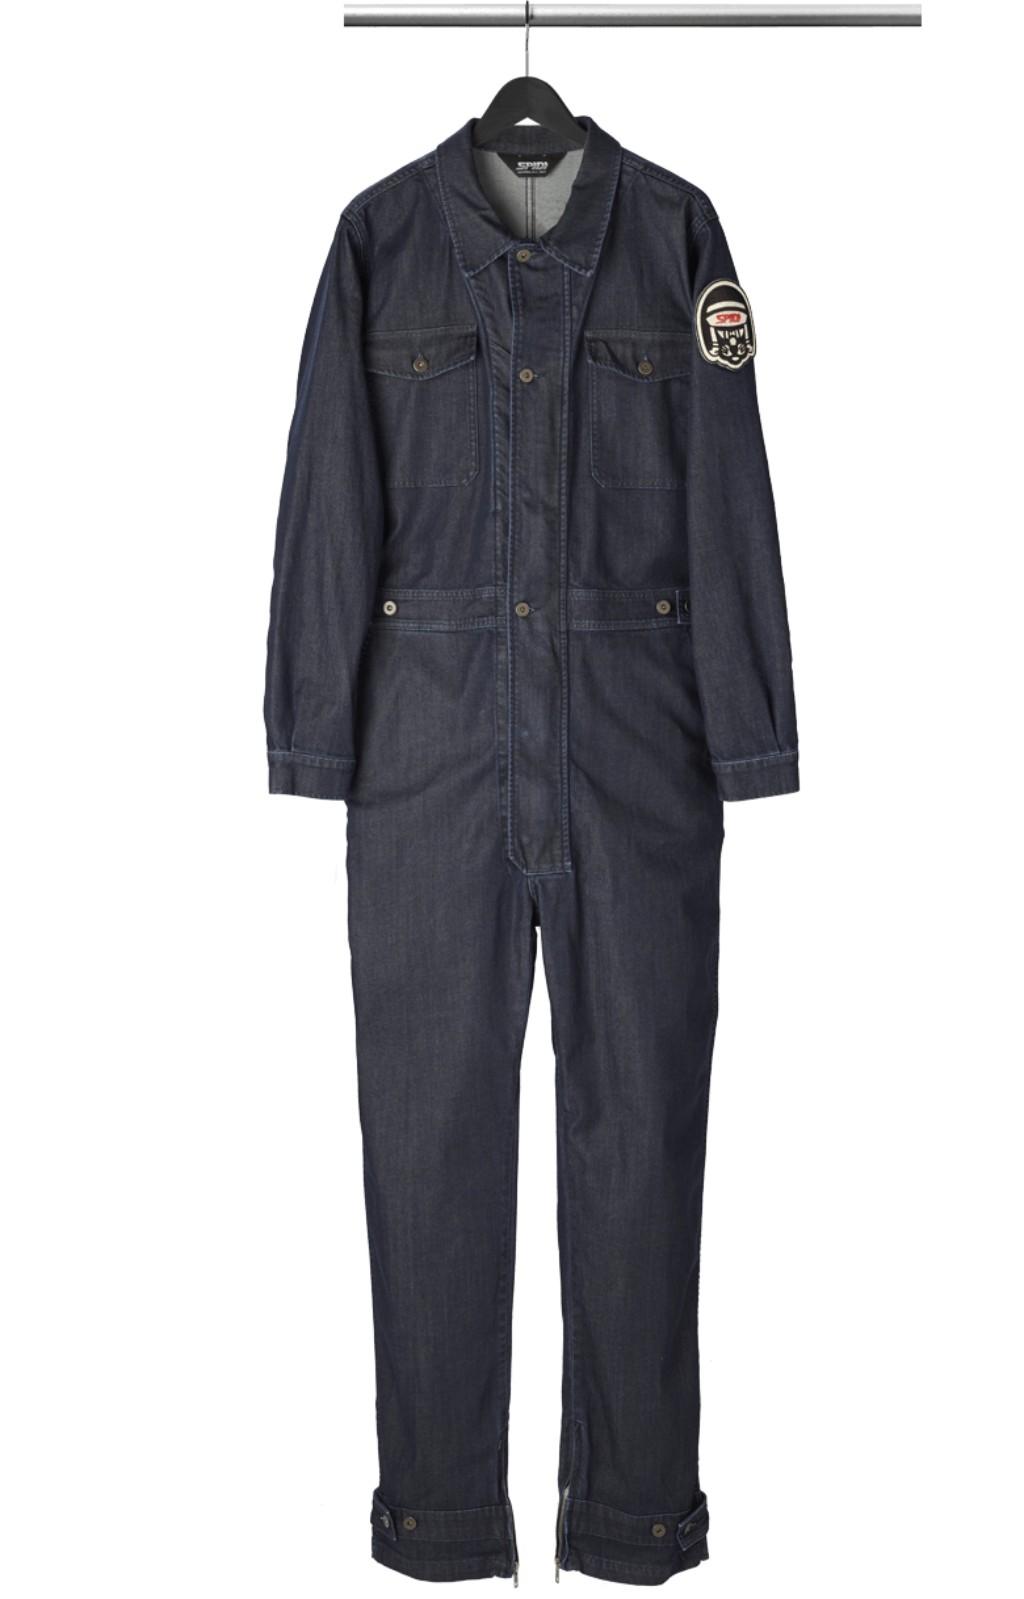 SPIDI スピーディーORIGINALS レディース スーツ